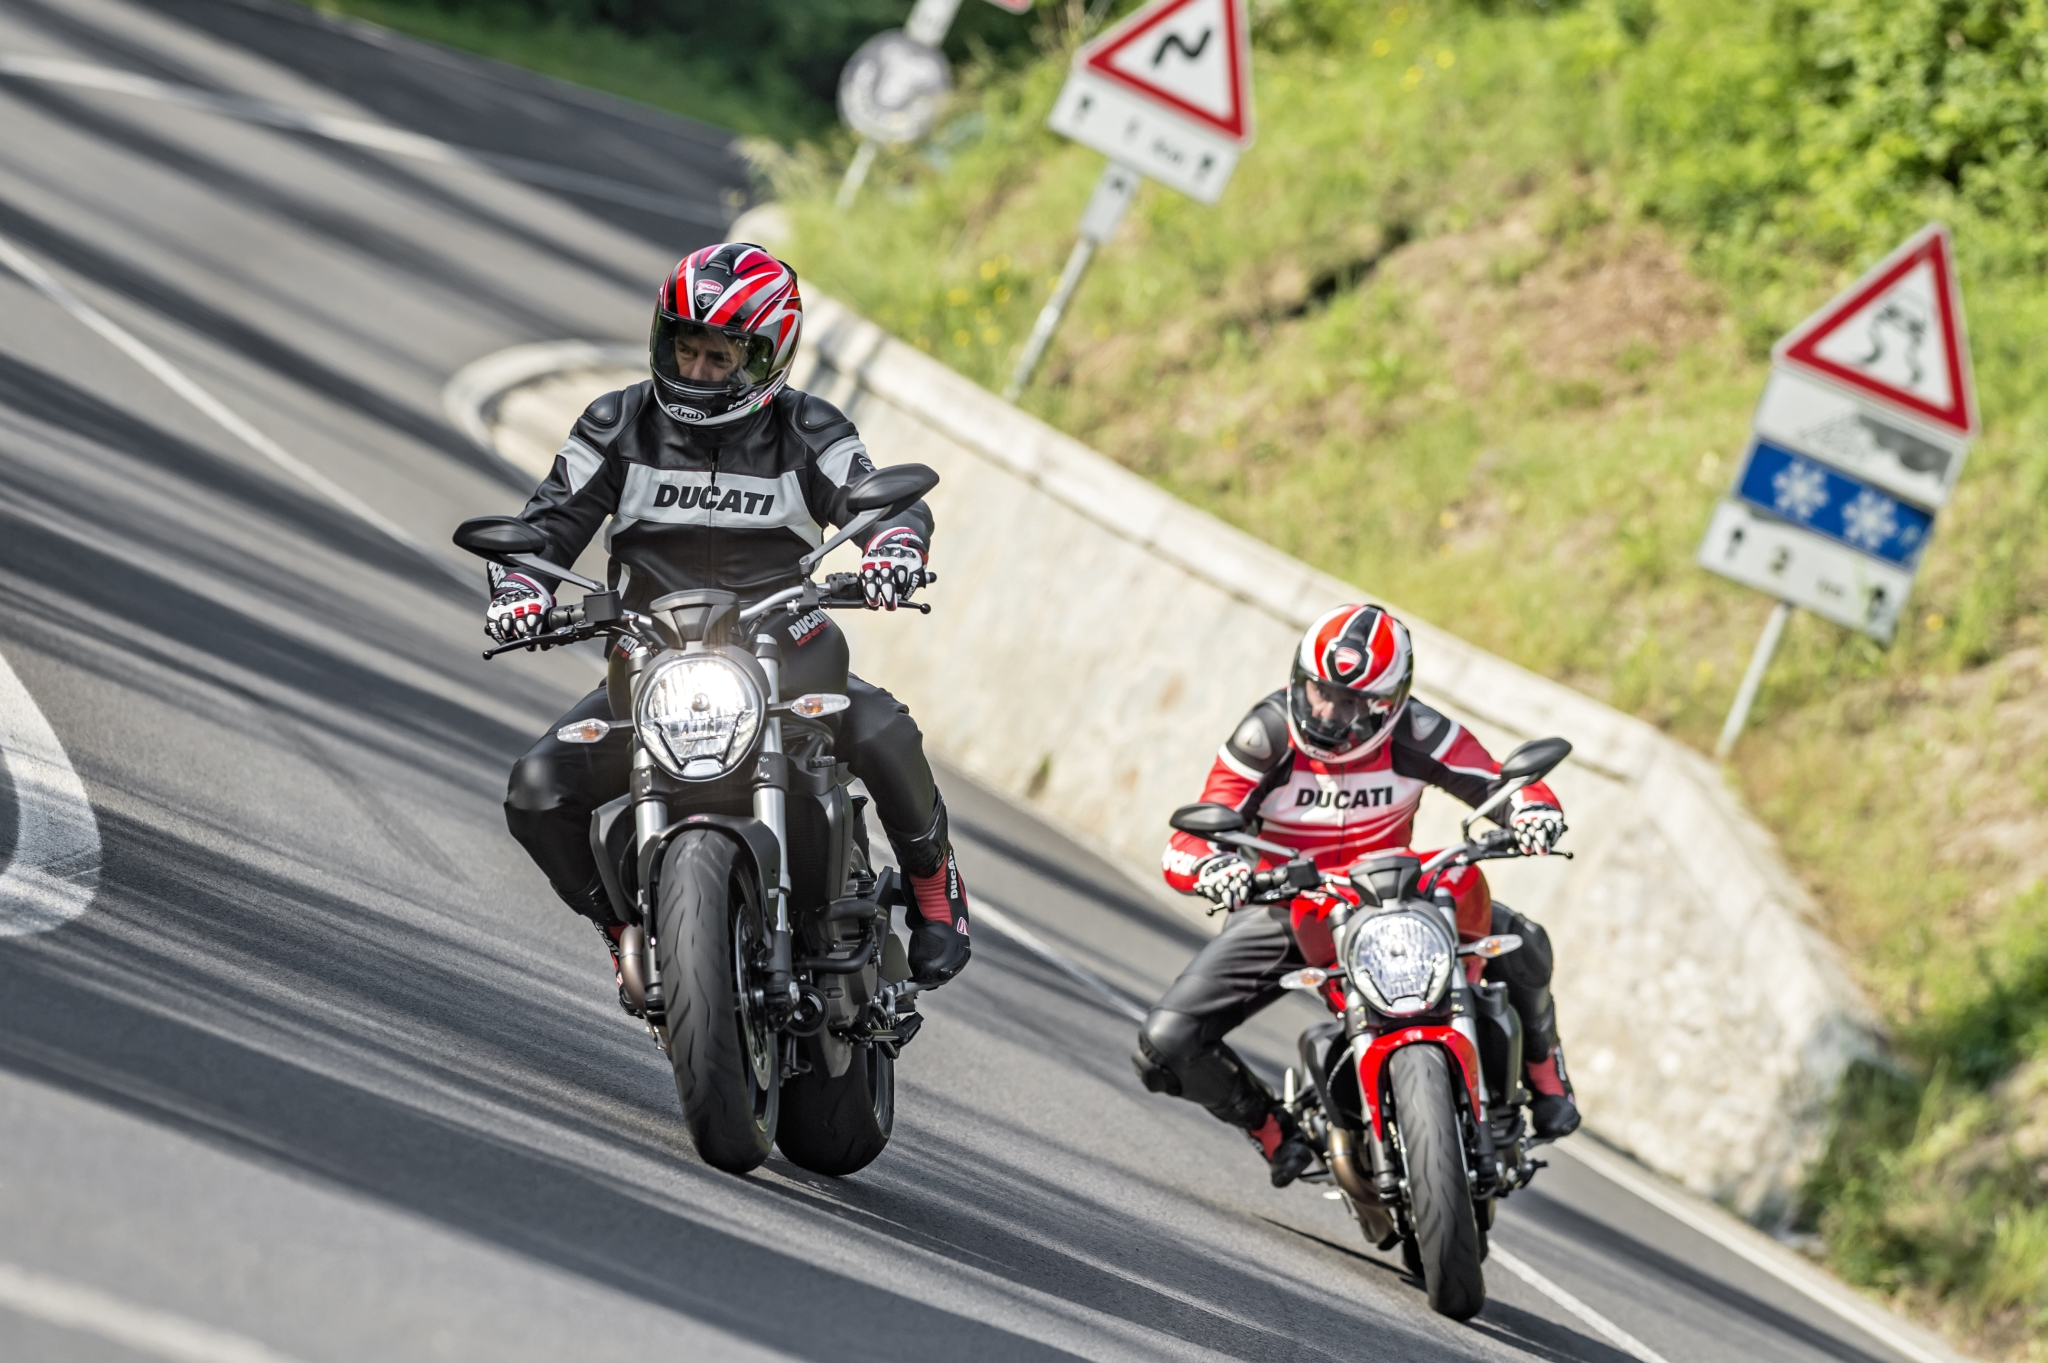 HD Wallpaper Ducati Monster  BestHDwallpapers